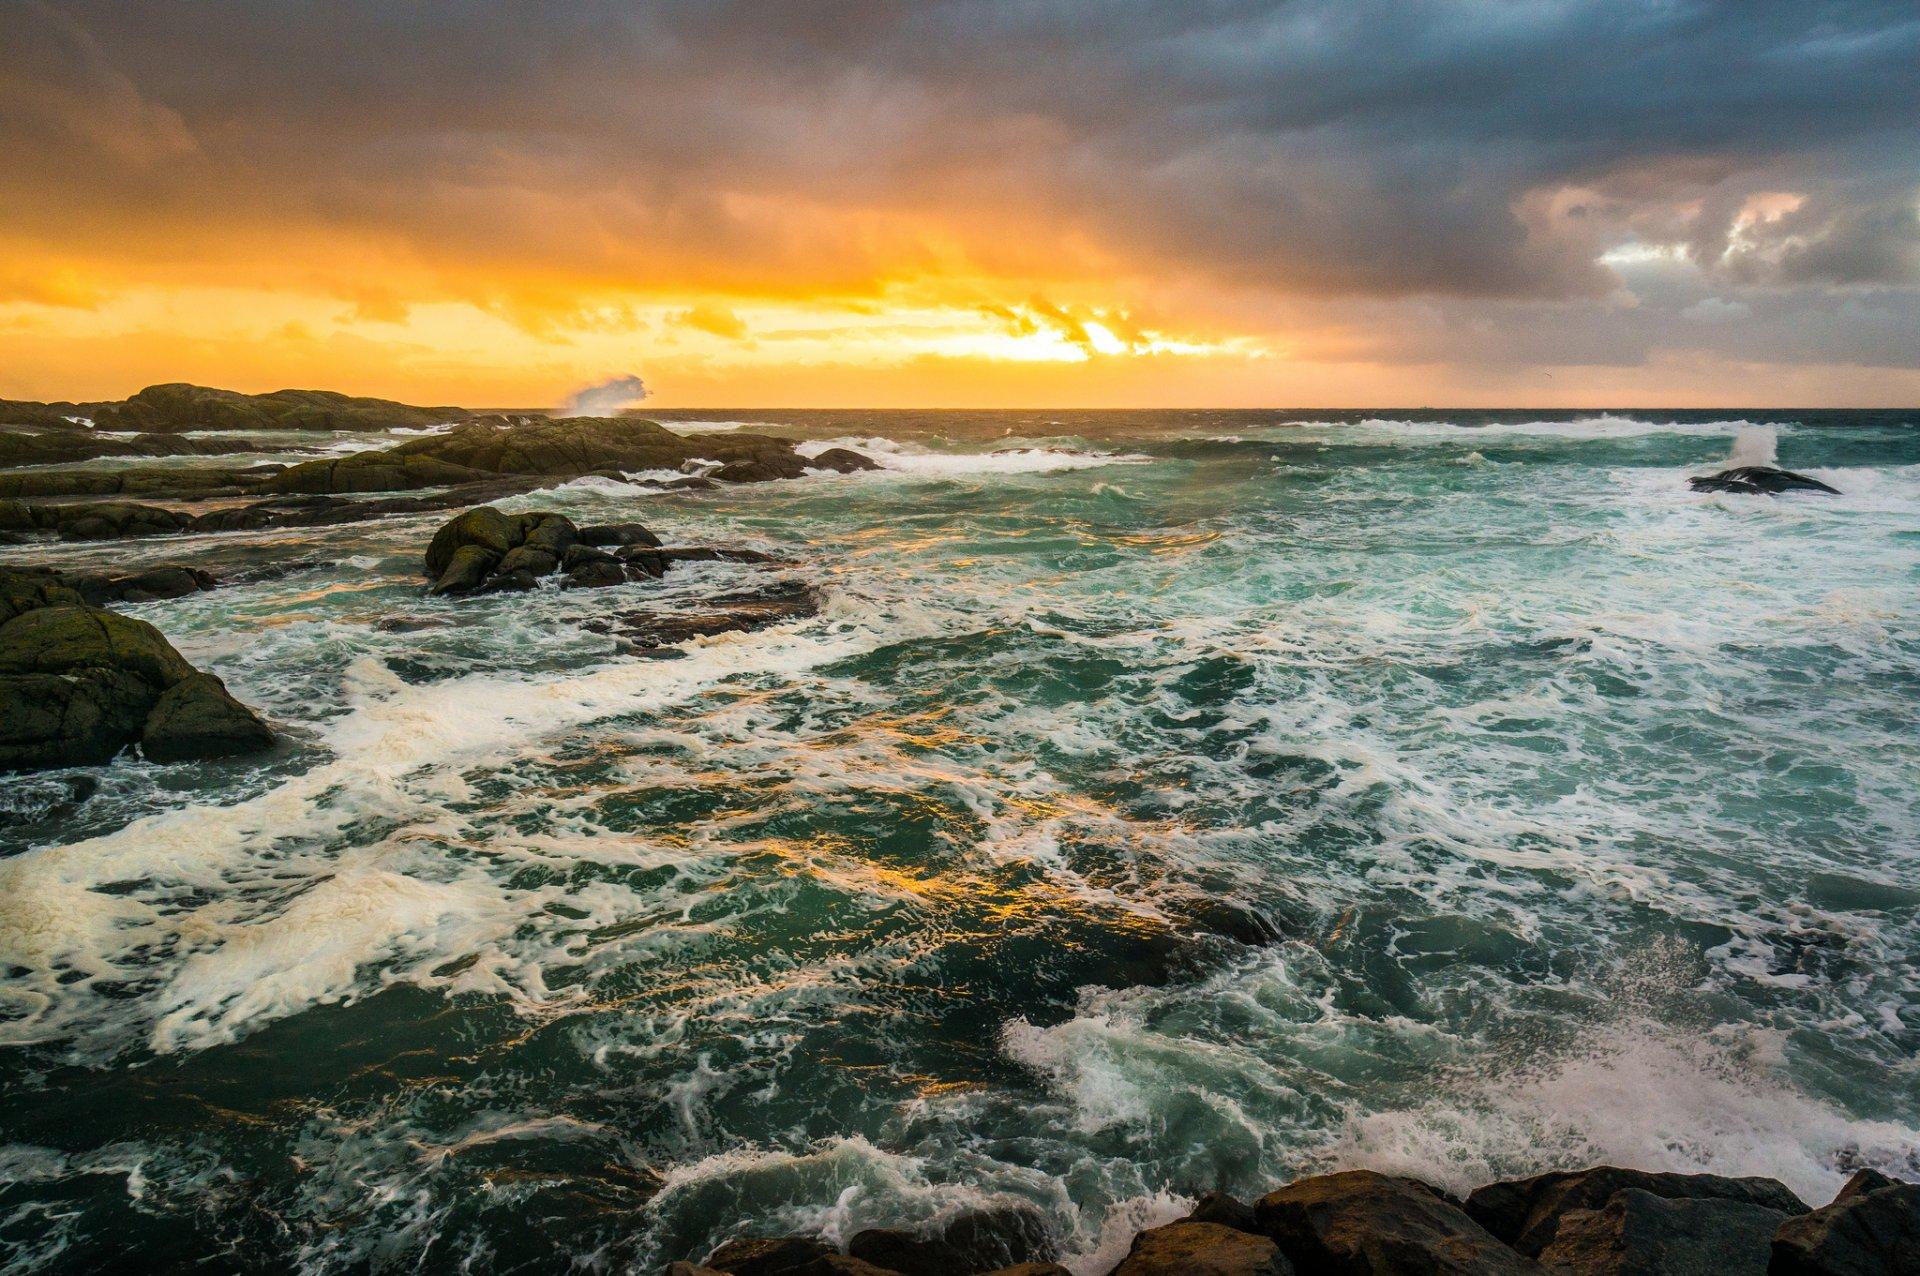 Четкие картинки моря